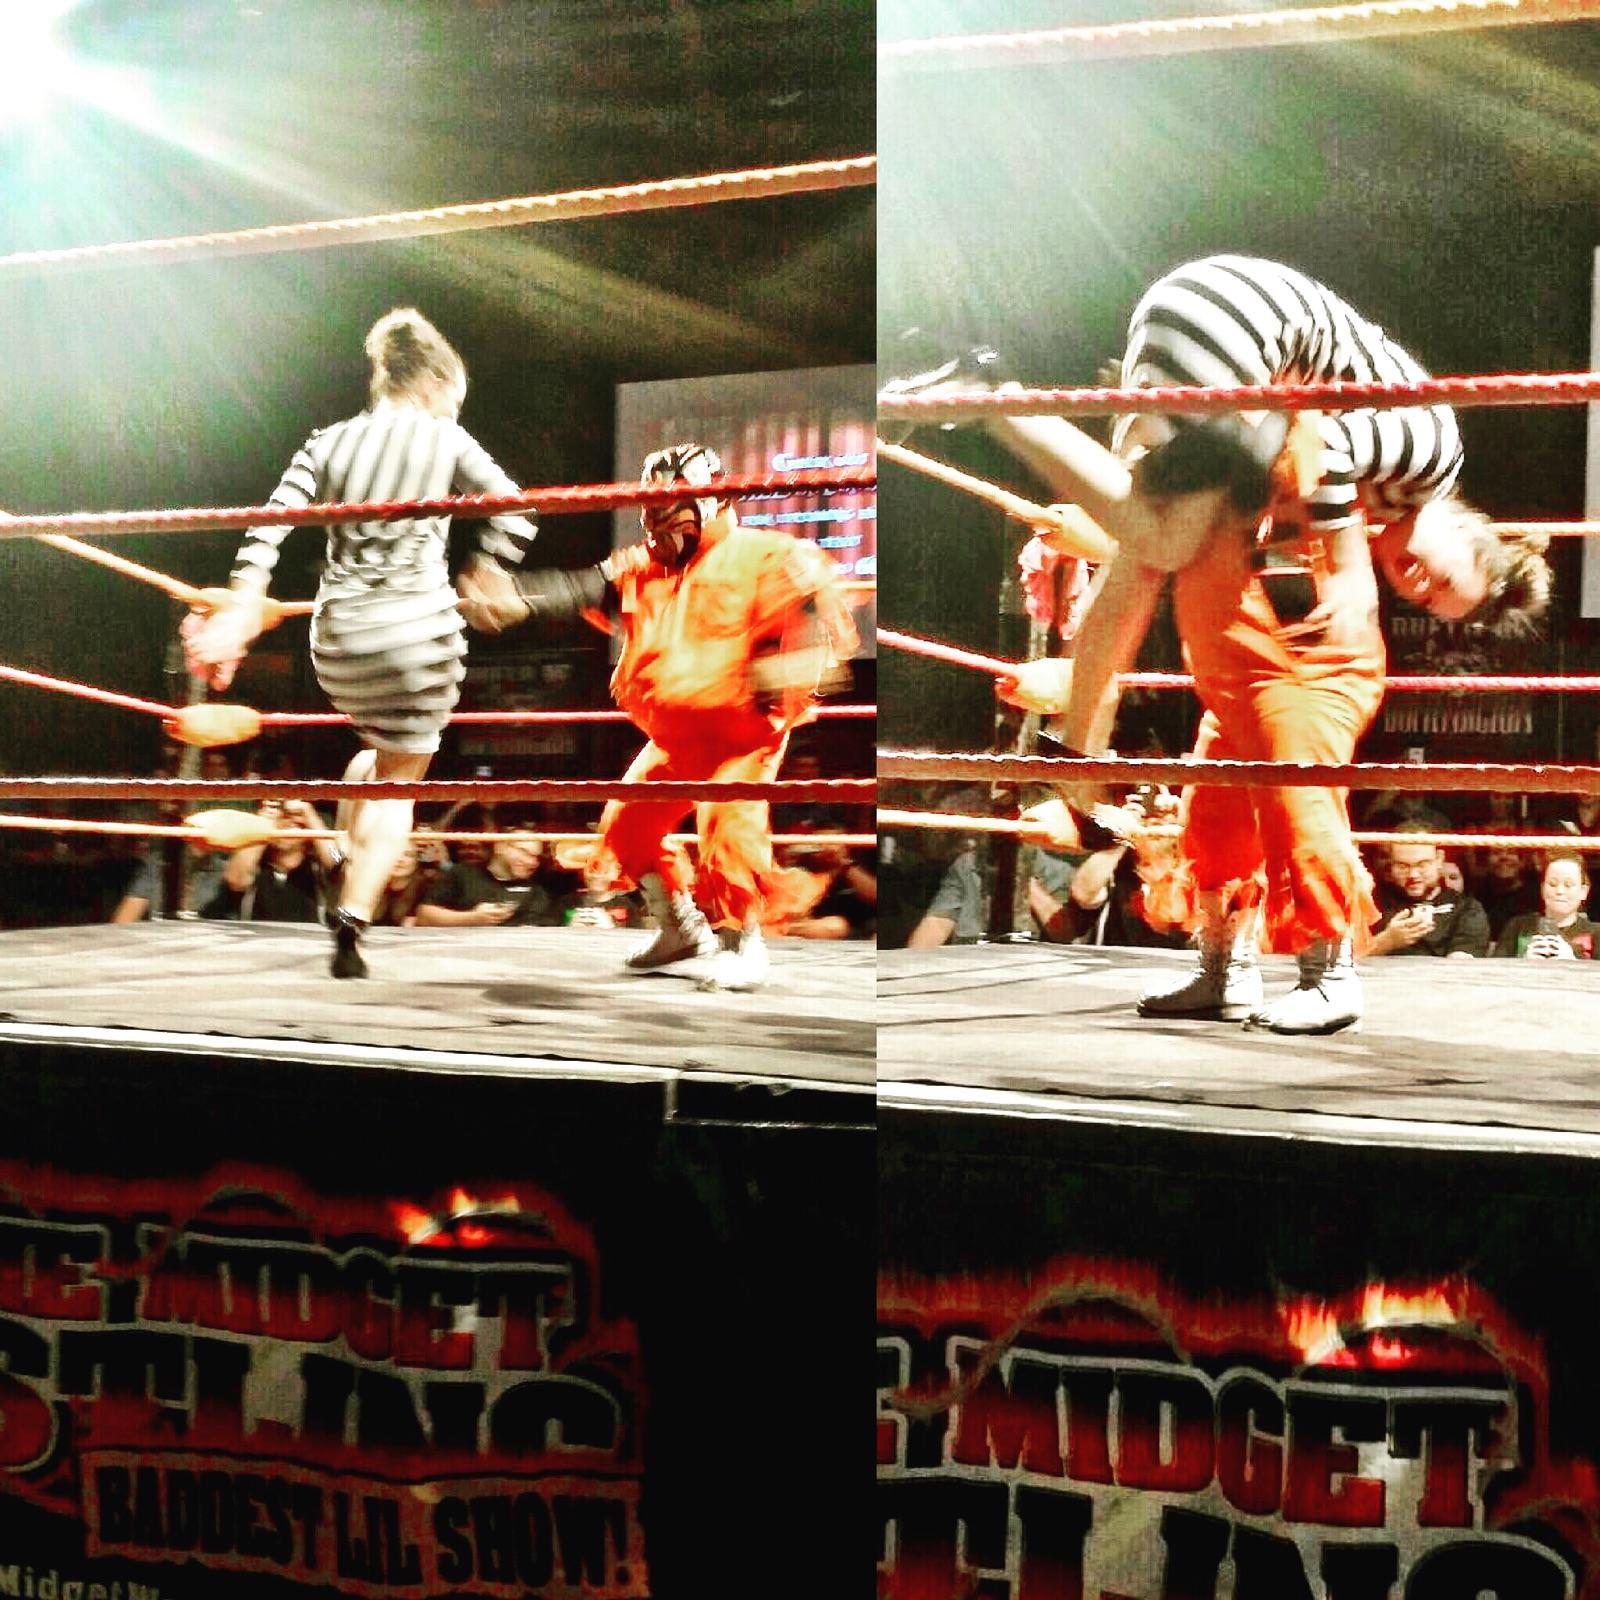 Illinois youth wrestling midget rankings anal